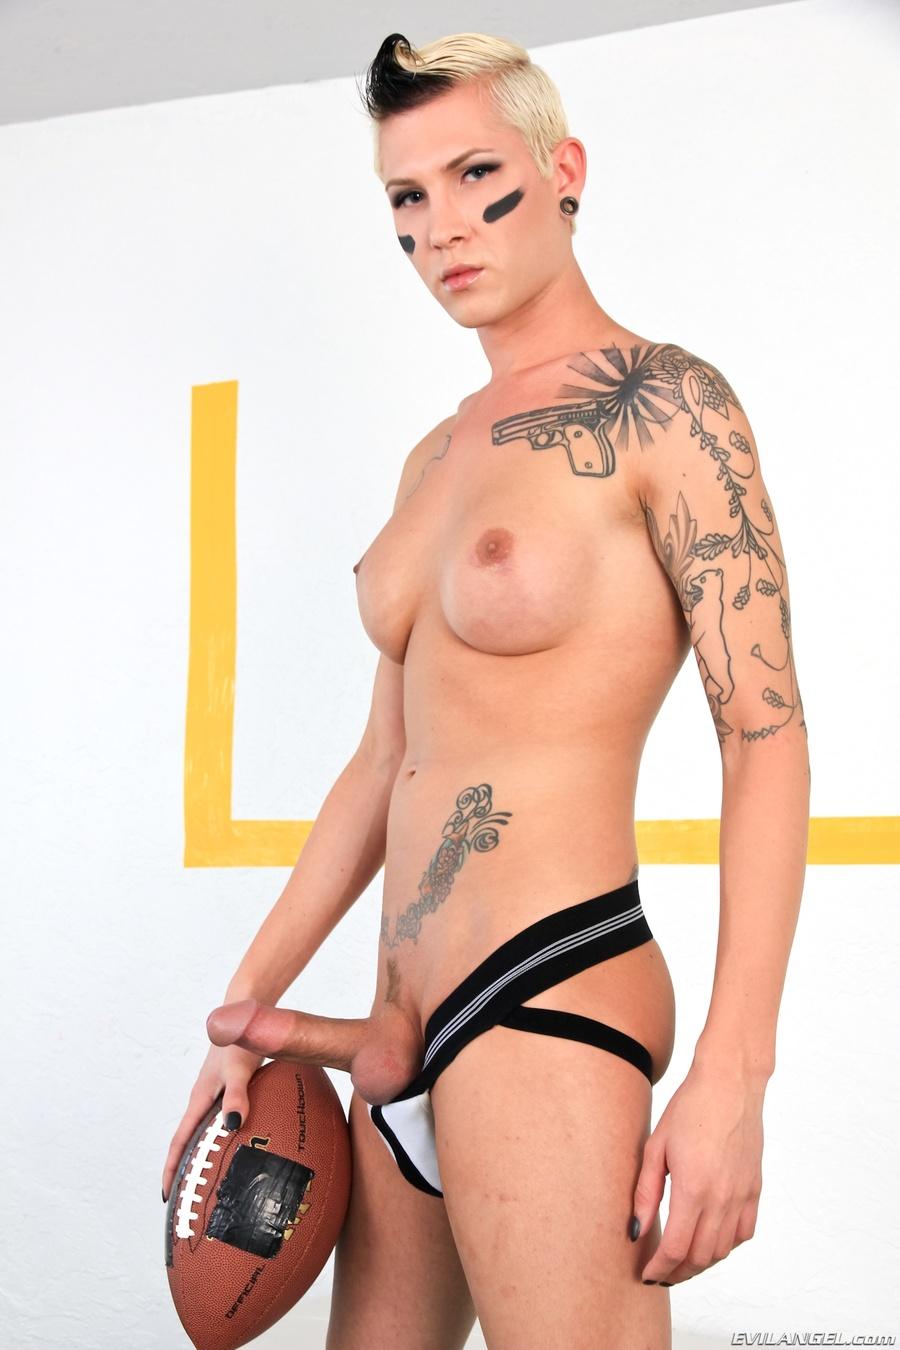 football-player-porn